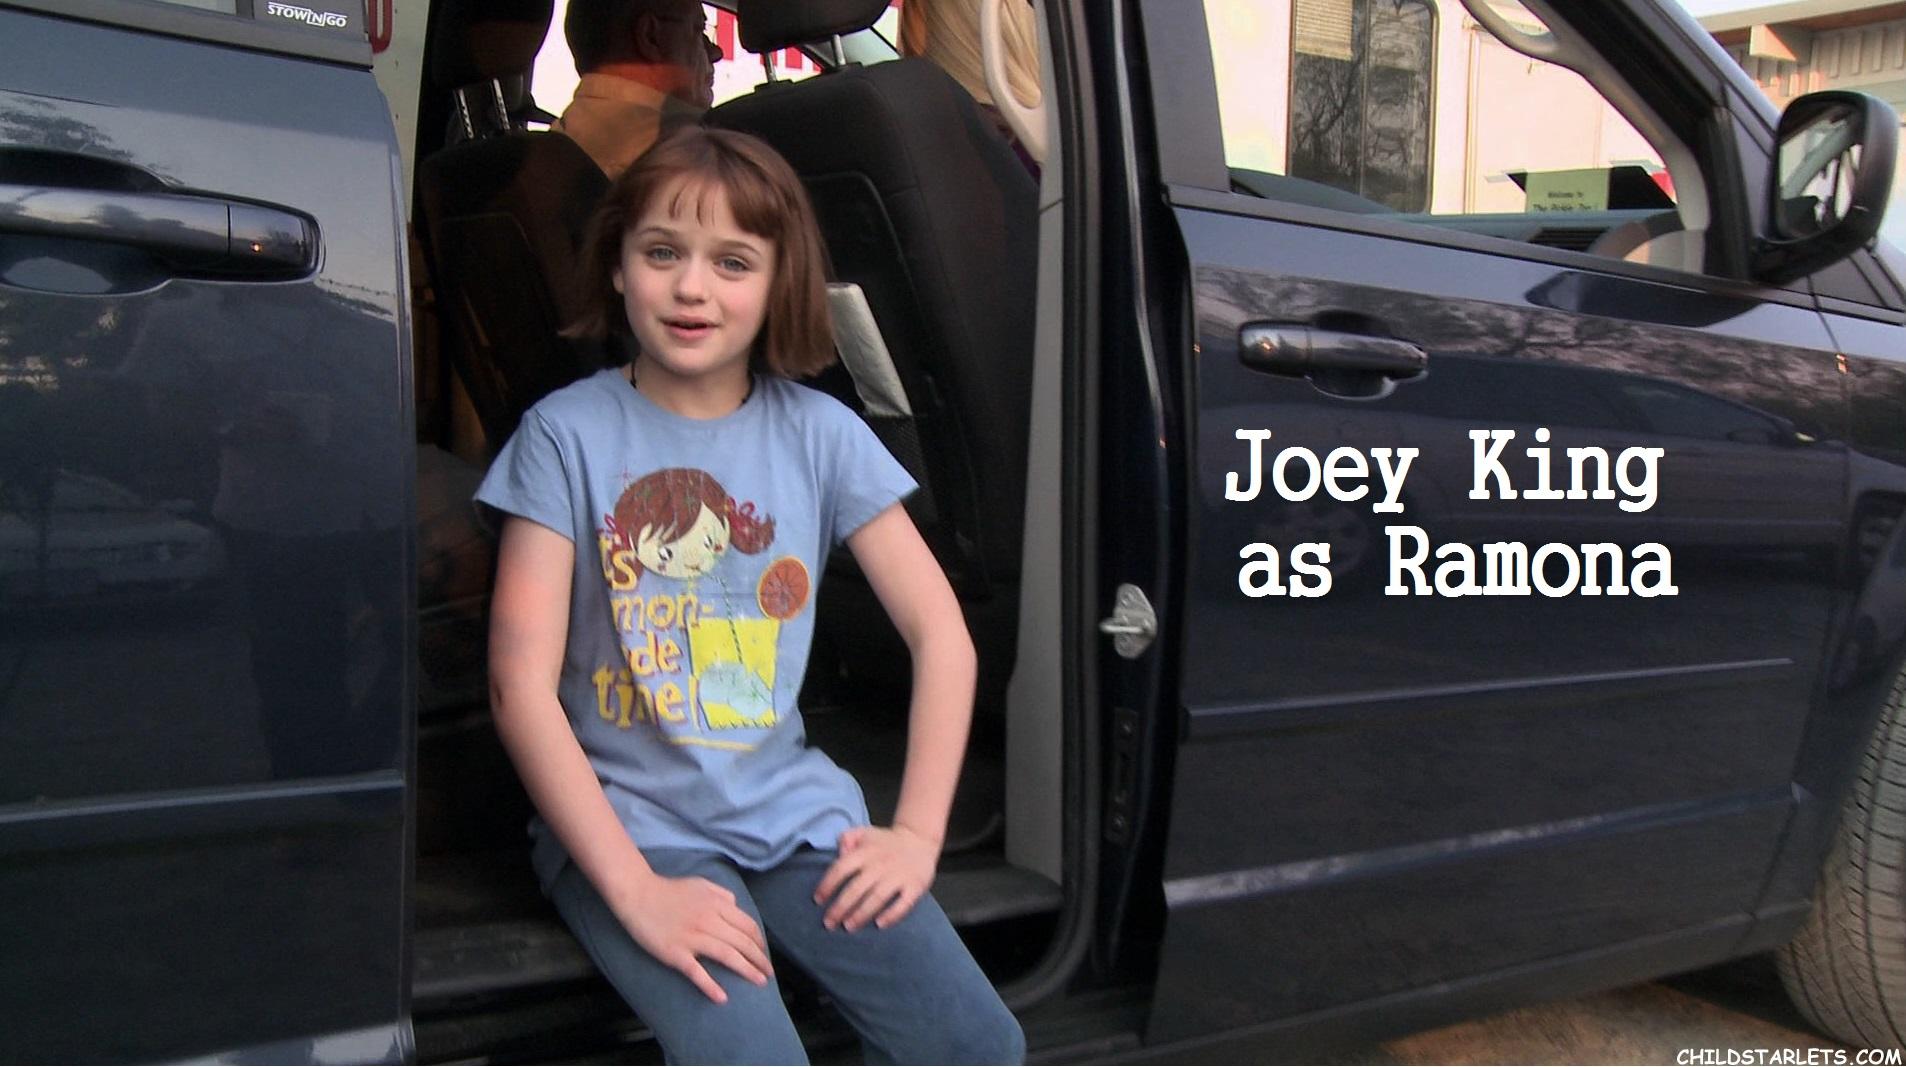 Joey King